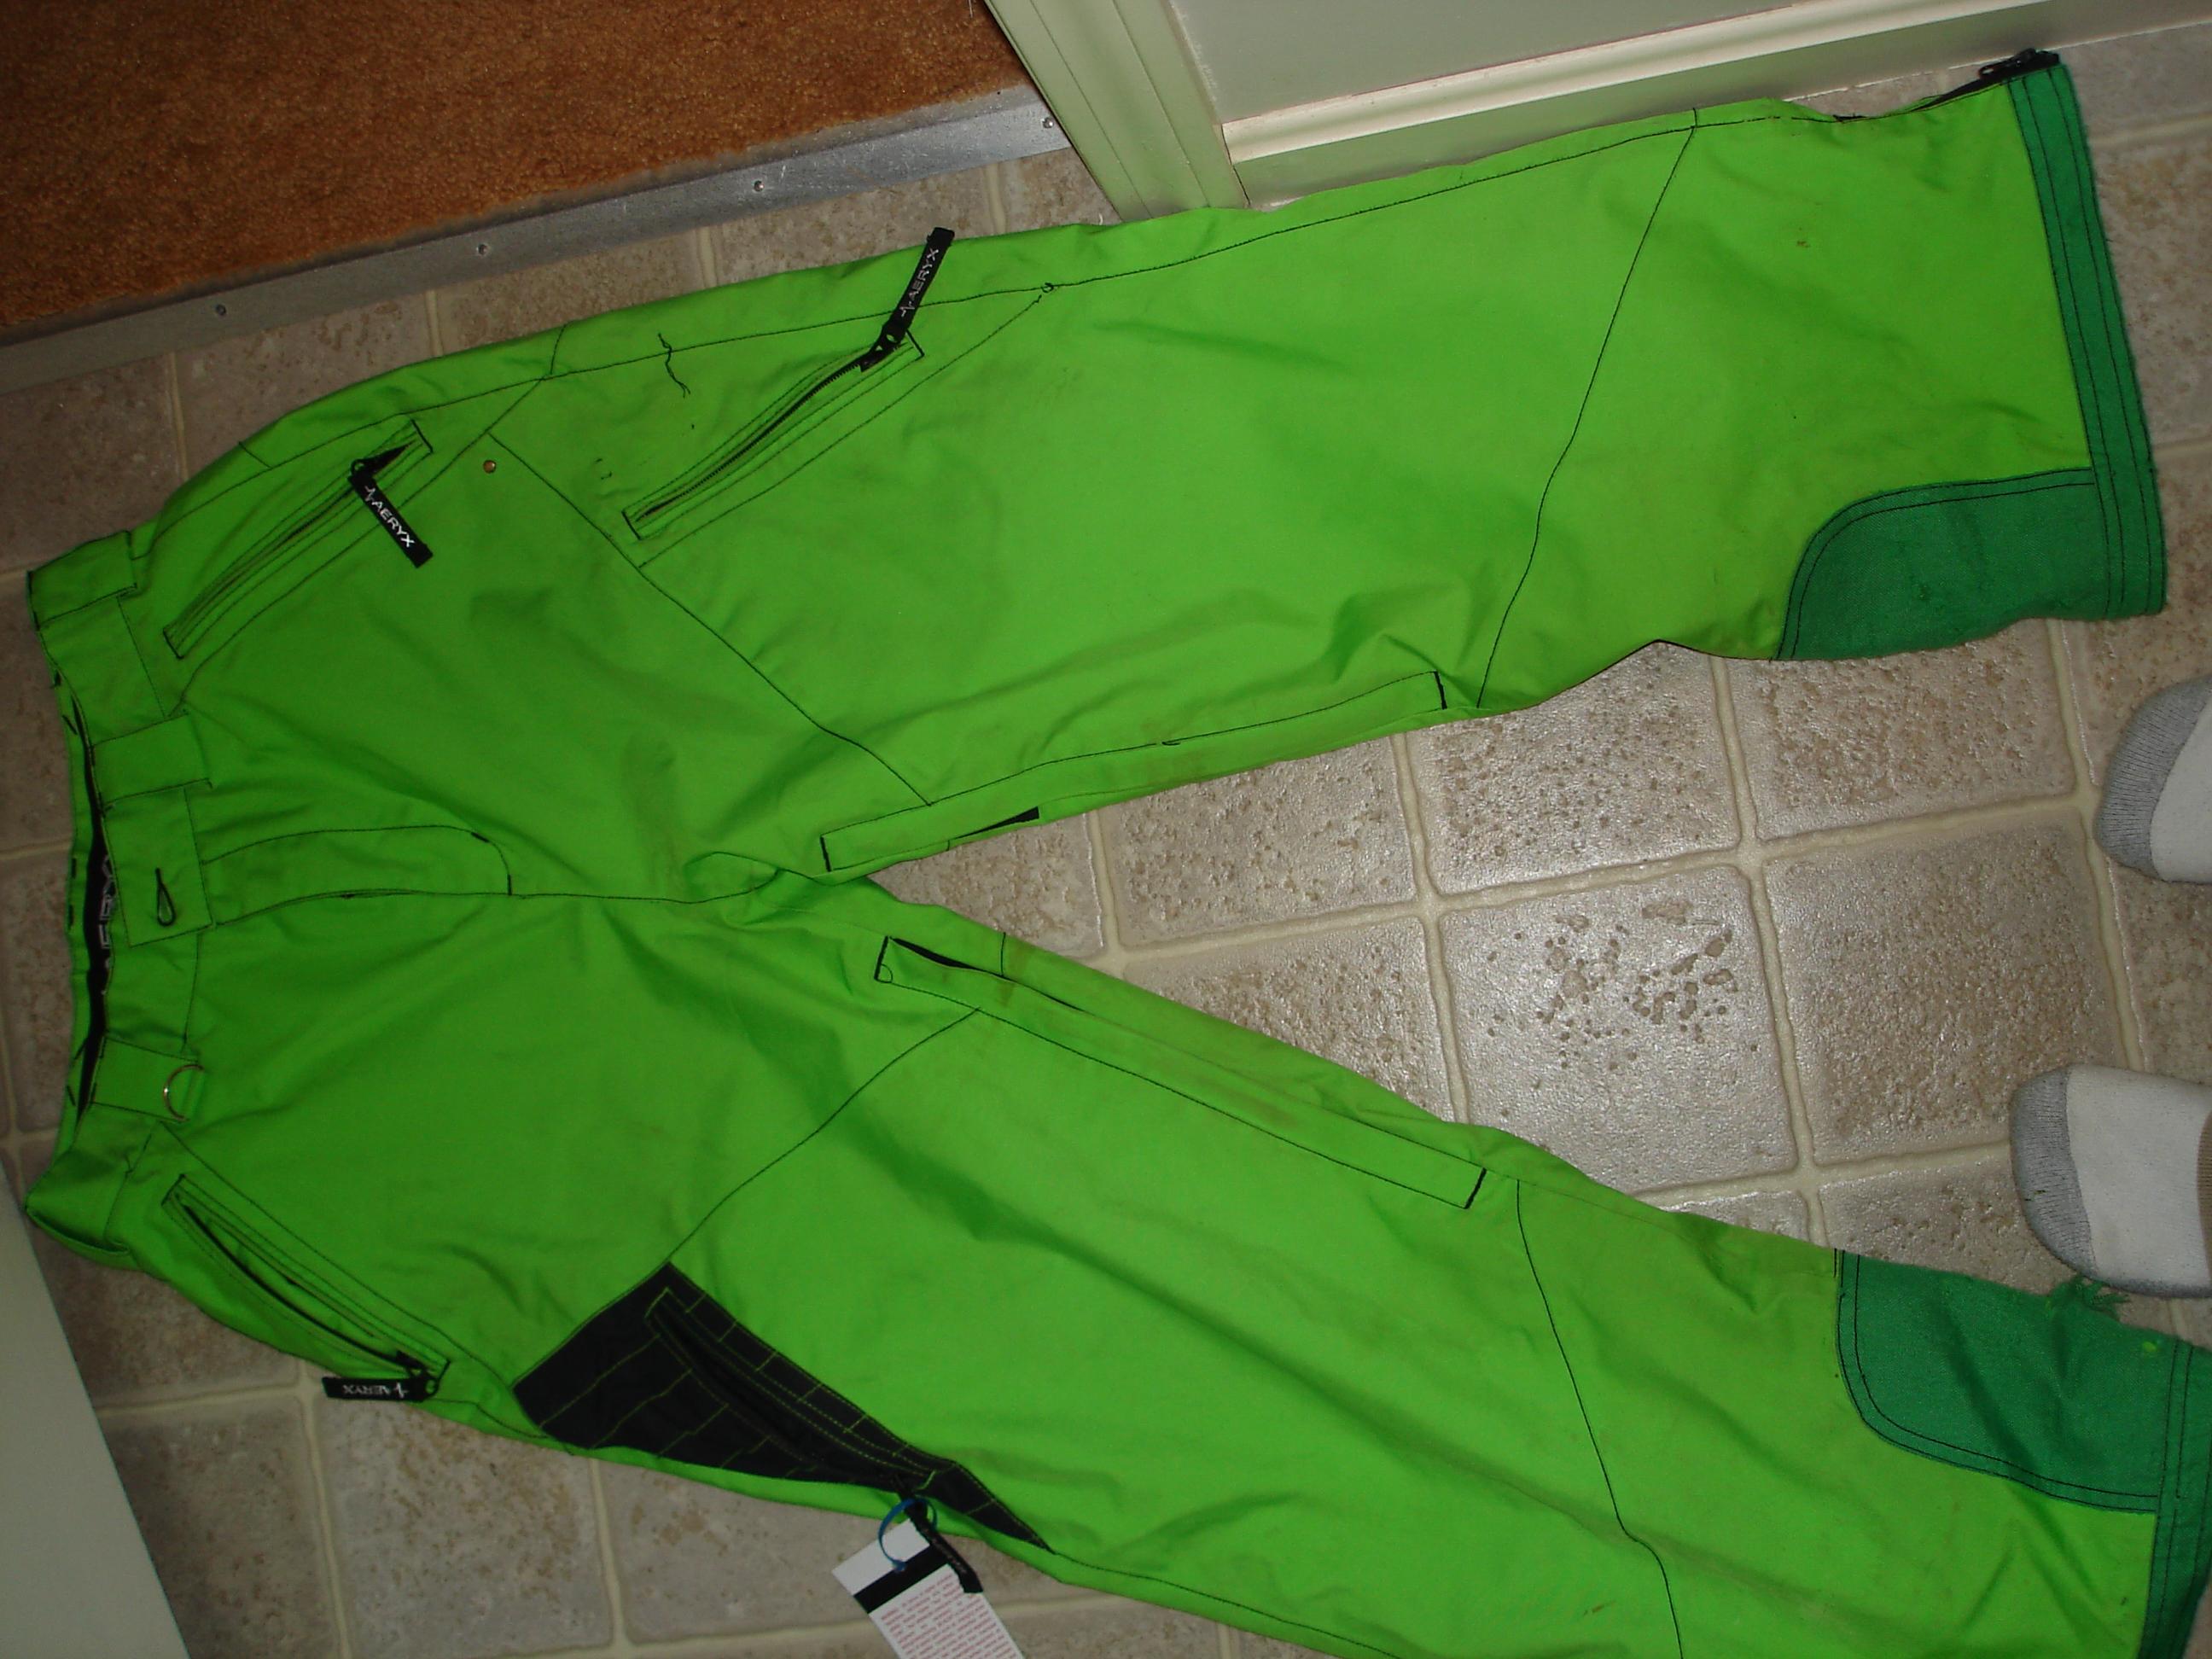 The green pants (aeryx small)